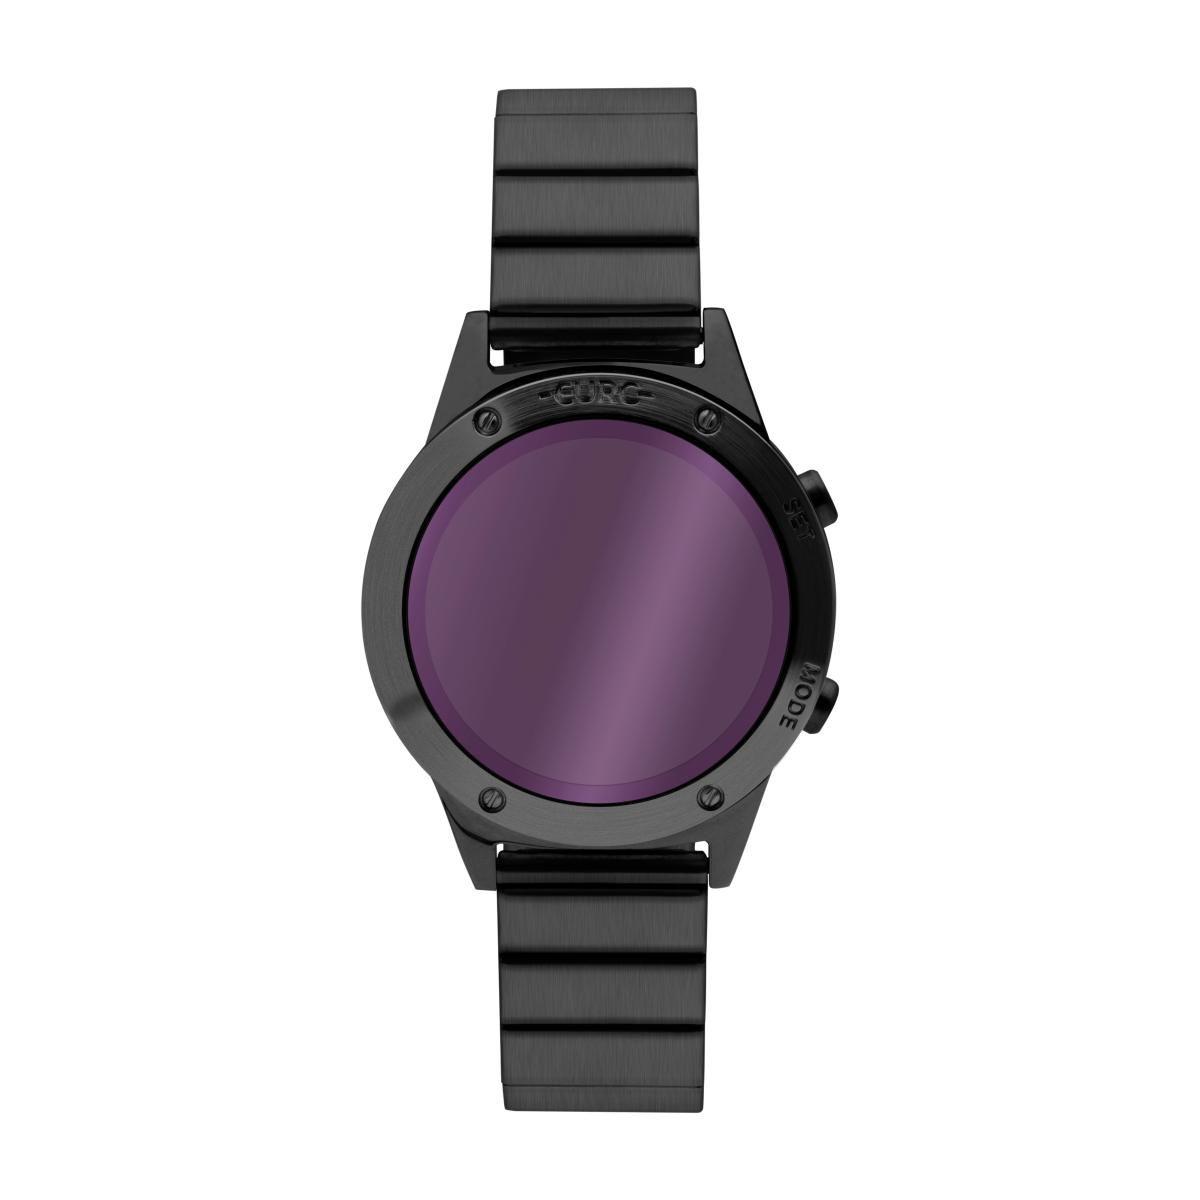 08713297812 Relógio Feminino Euro Fashion Fit Reflexos EUJHS31BAD 4G 40mm Aço Preto